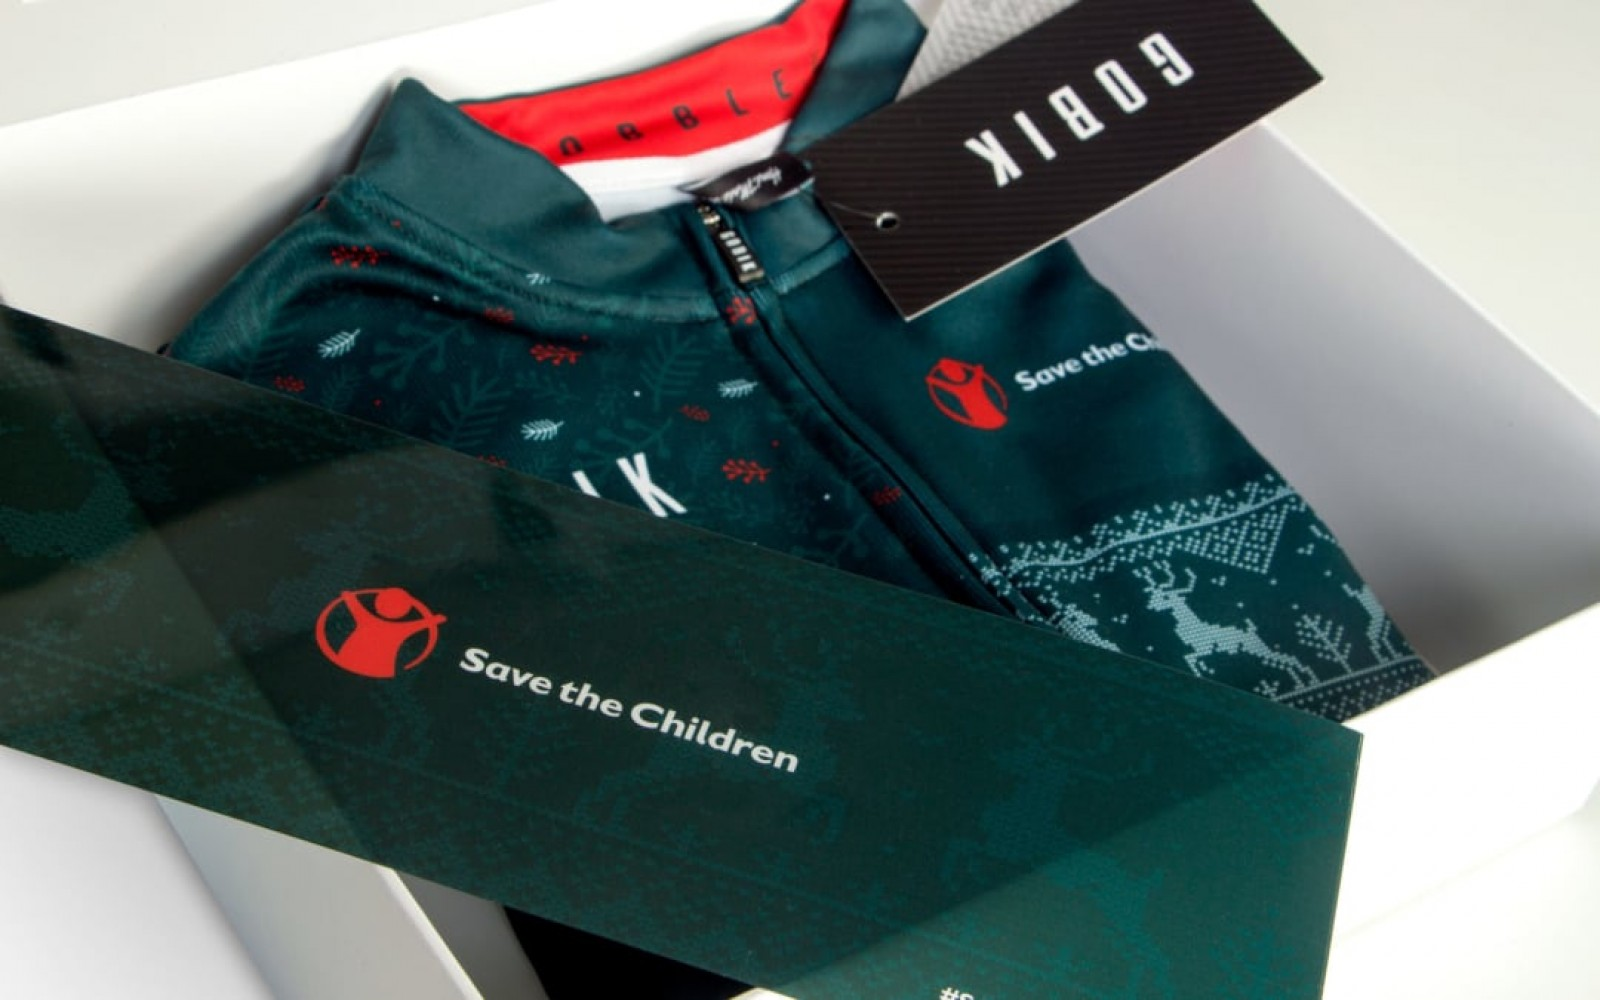 gobik-black-Friday-save-the-children/